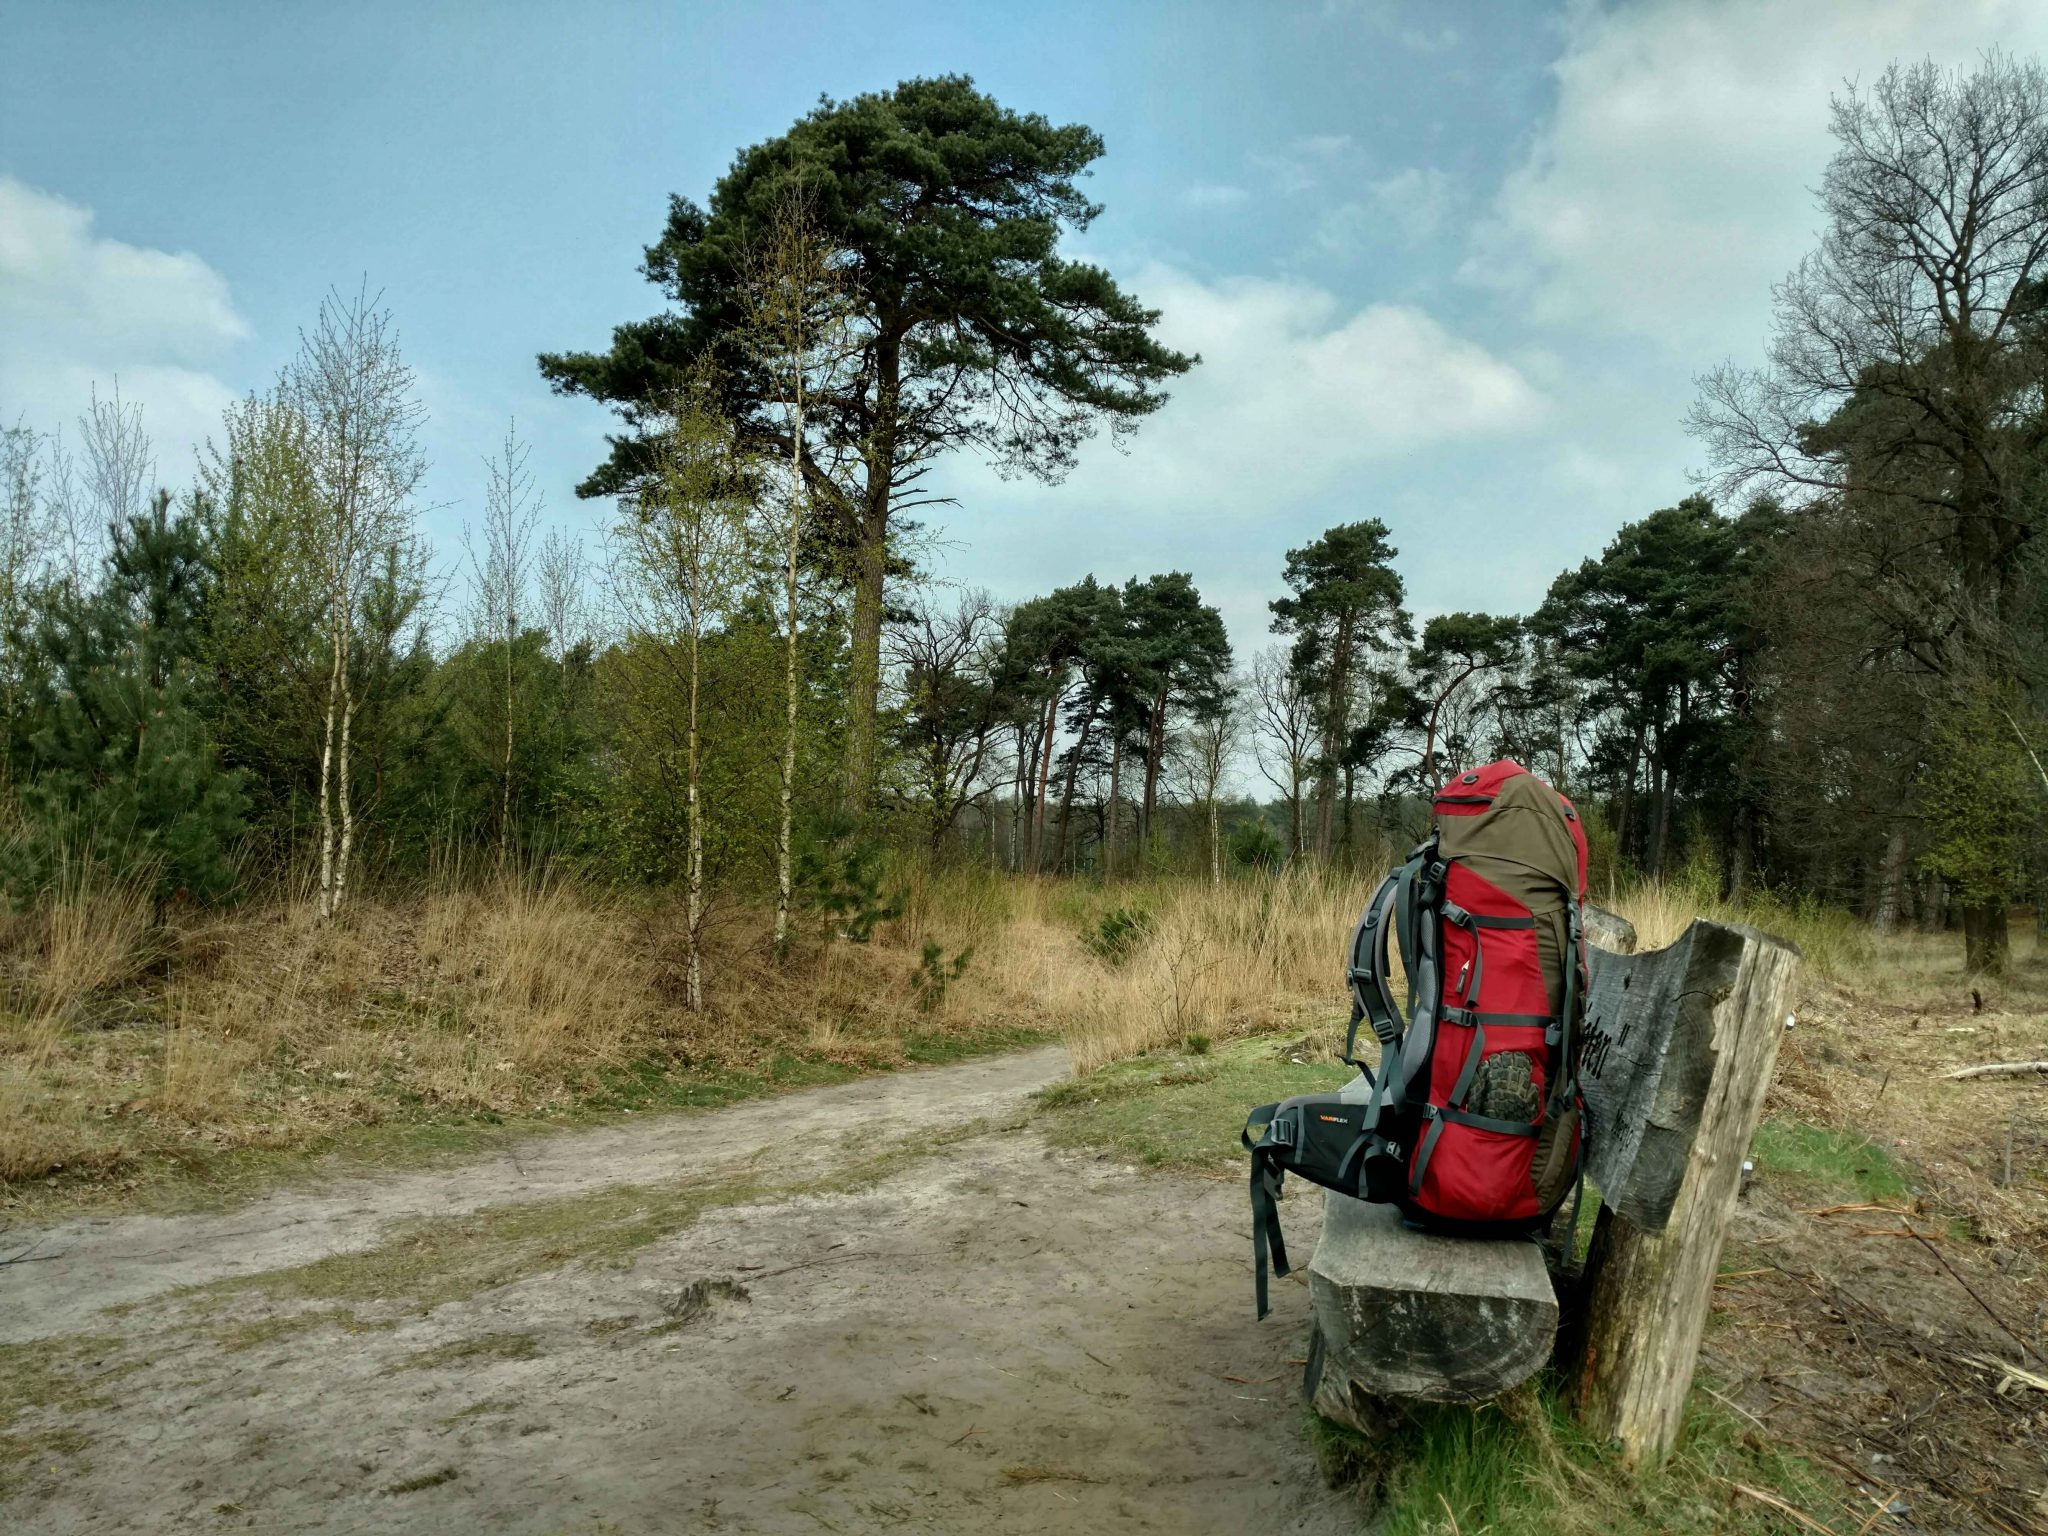 Picknick_pilgrims_route_nl